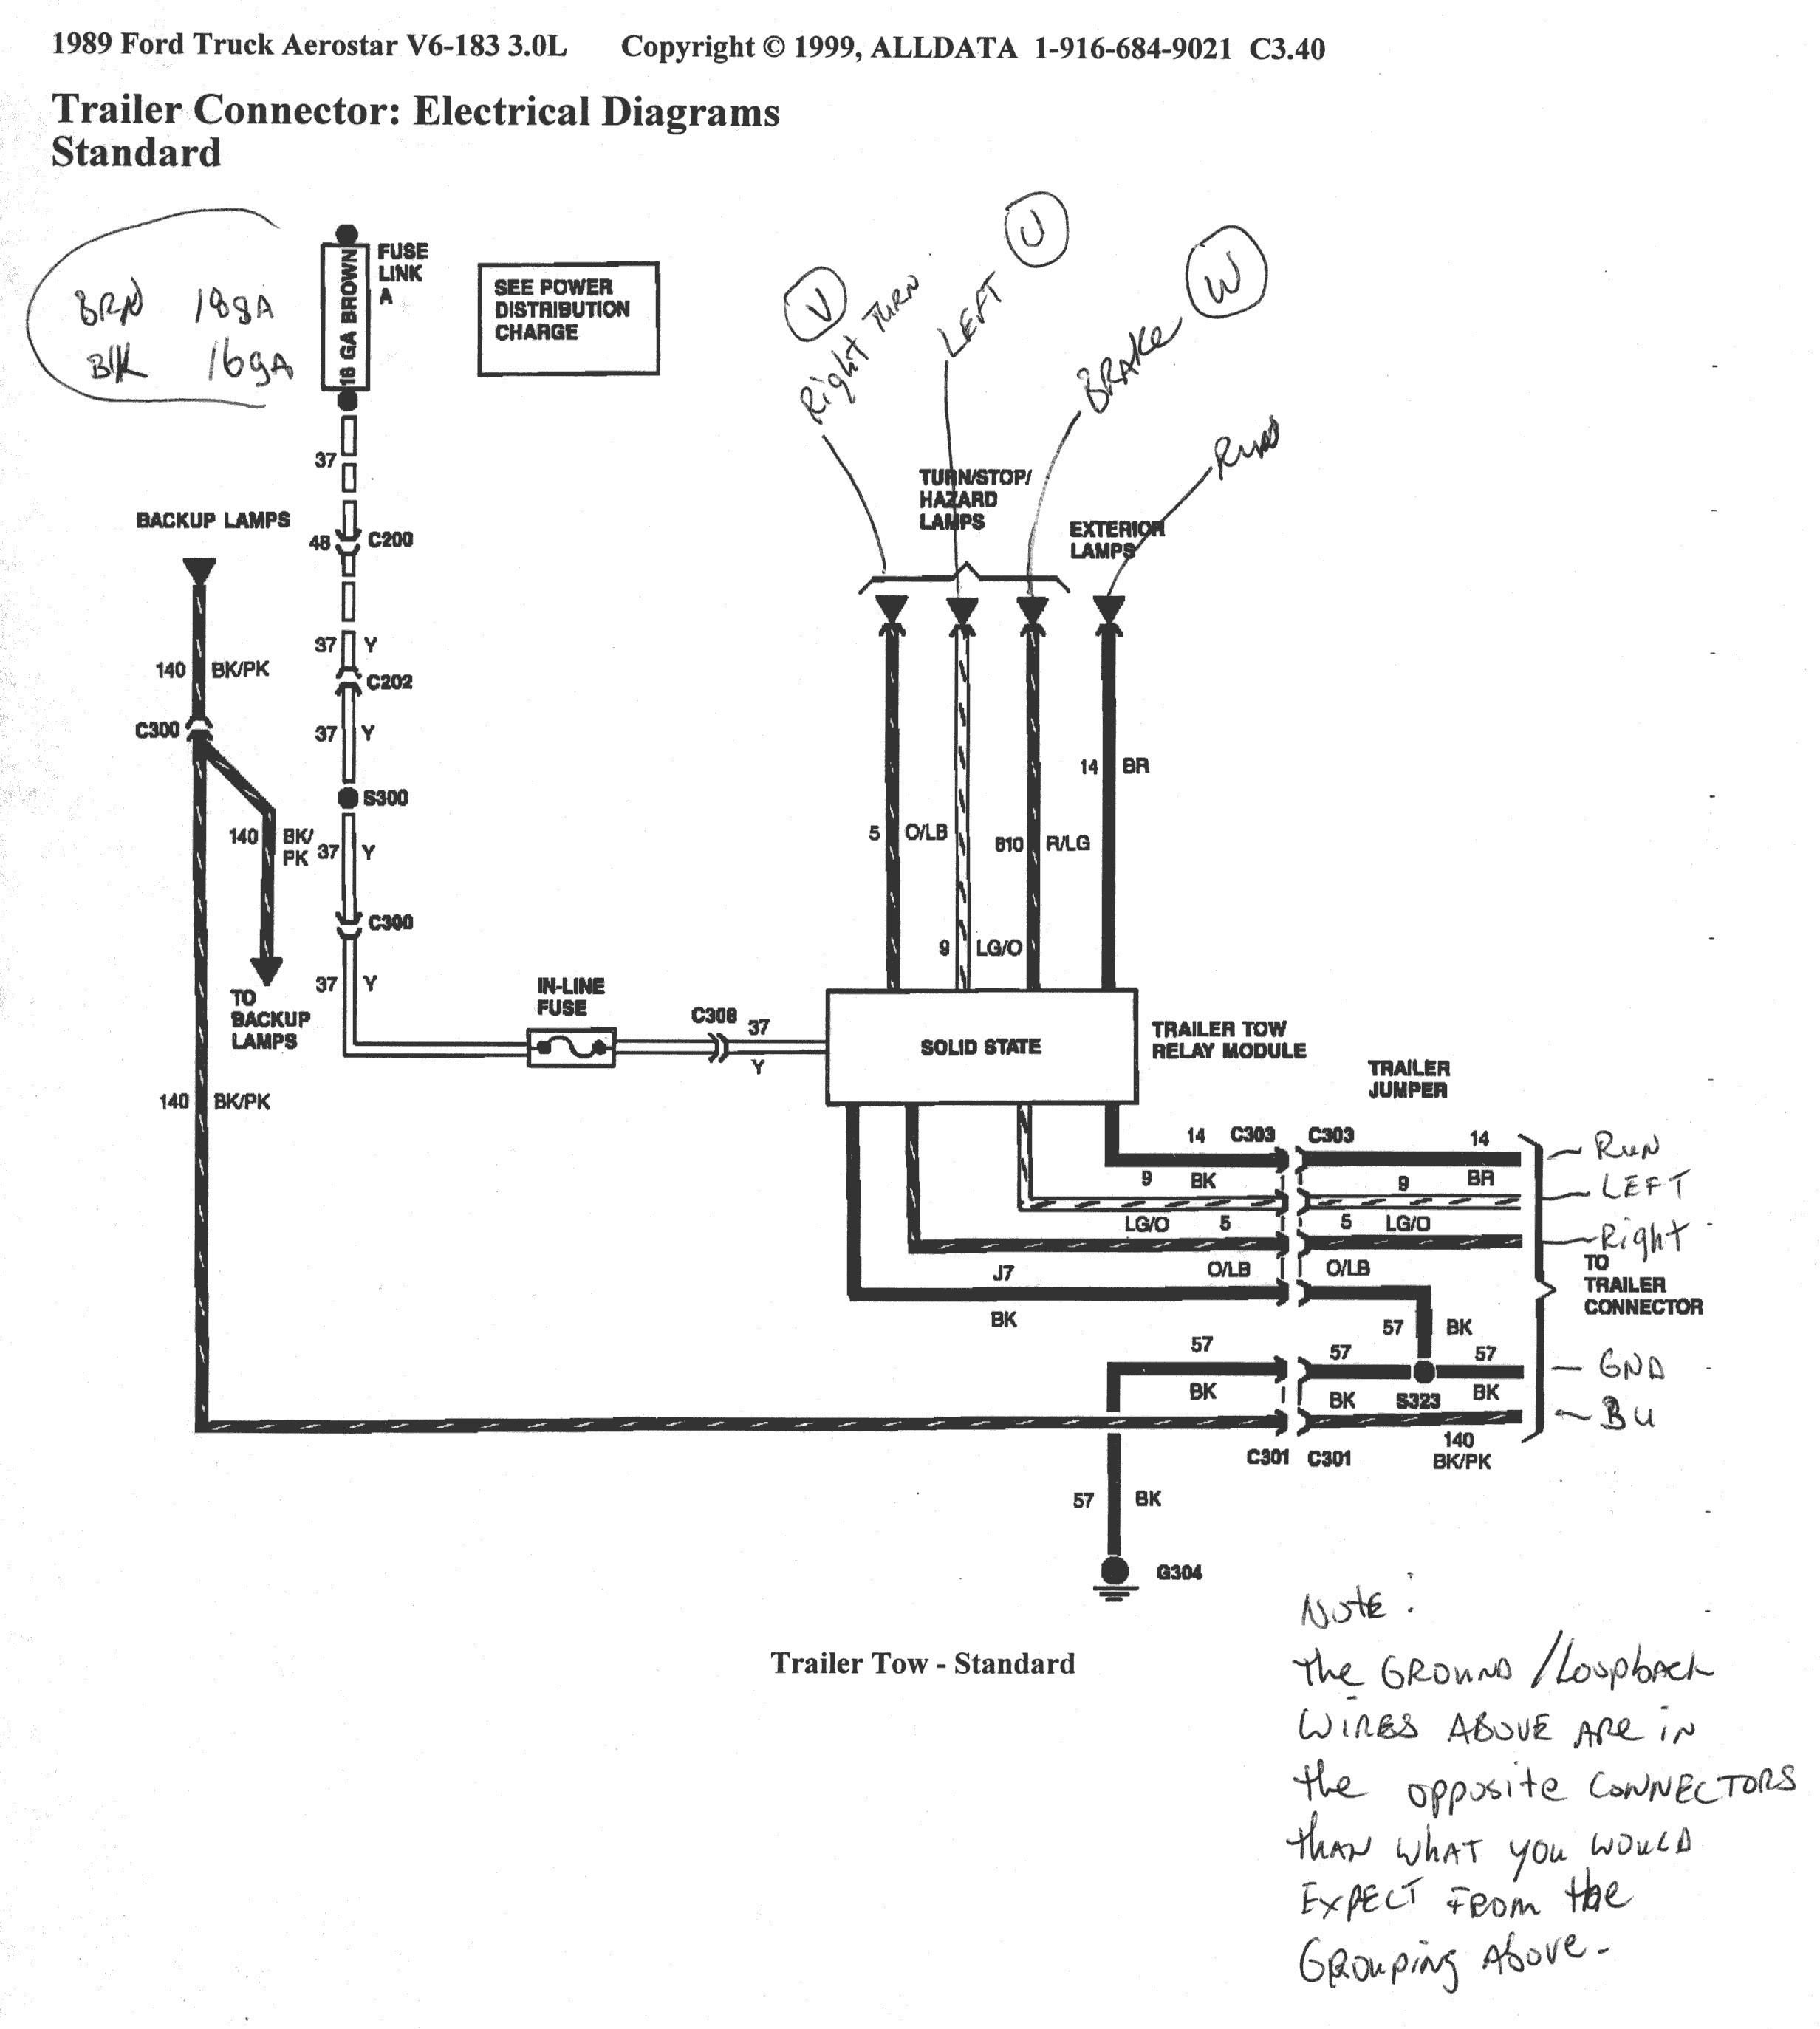 [DIAGRAM_5LK]  89 F150 Wiring Diagram Lights - 2006 Mazda Tribute Fuse Box Diagram for  Wiring Diagram Schematics | Ford Truck Trailer Wiring |  | Wiring Diagram Schematics